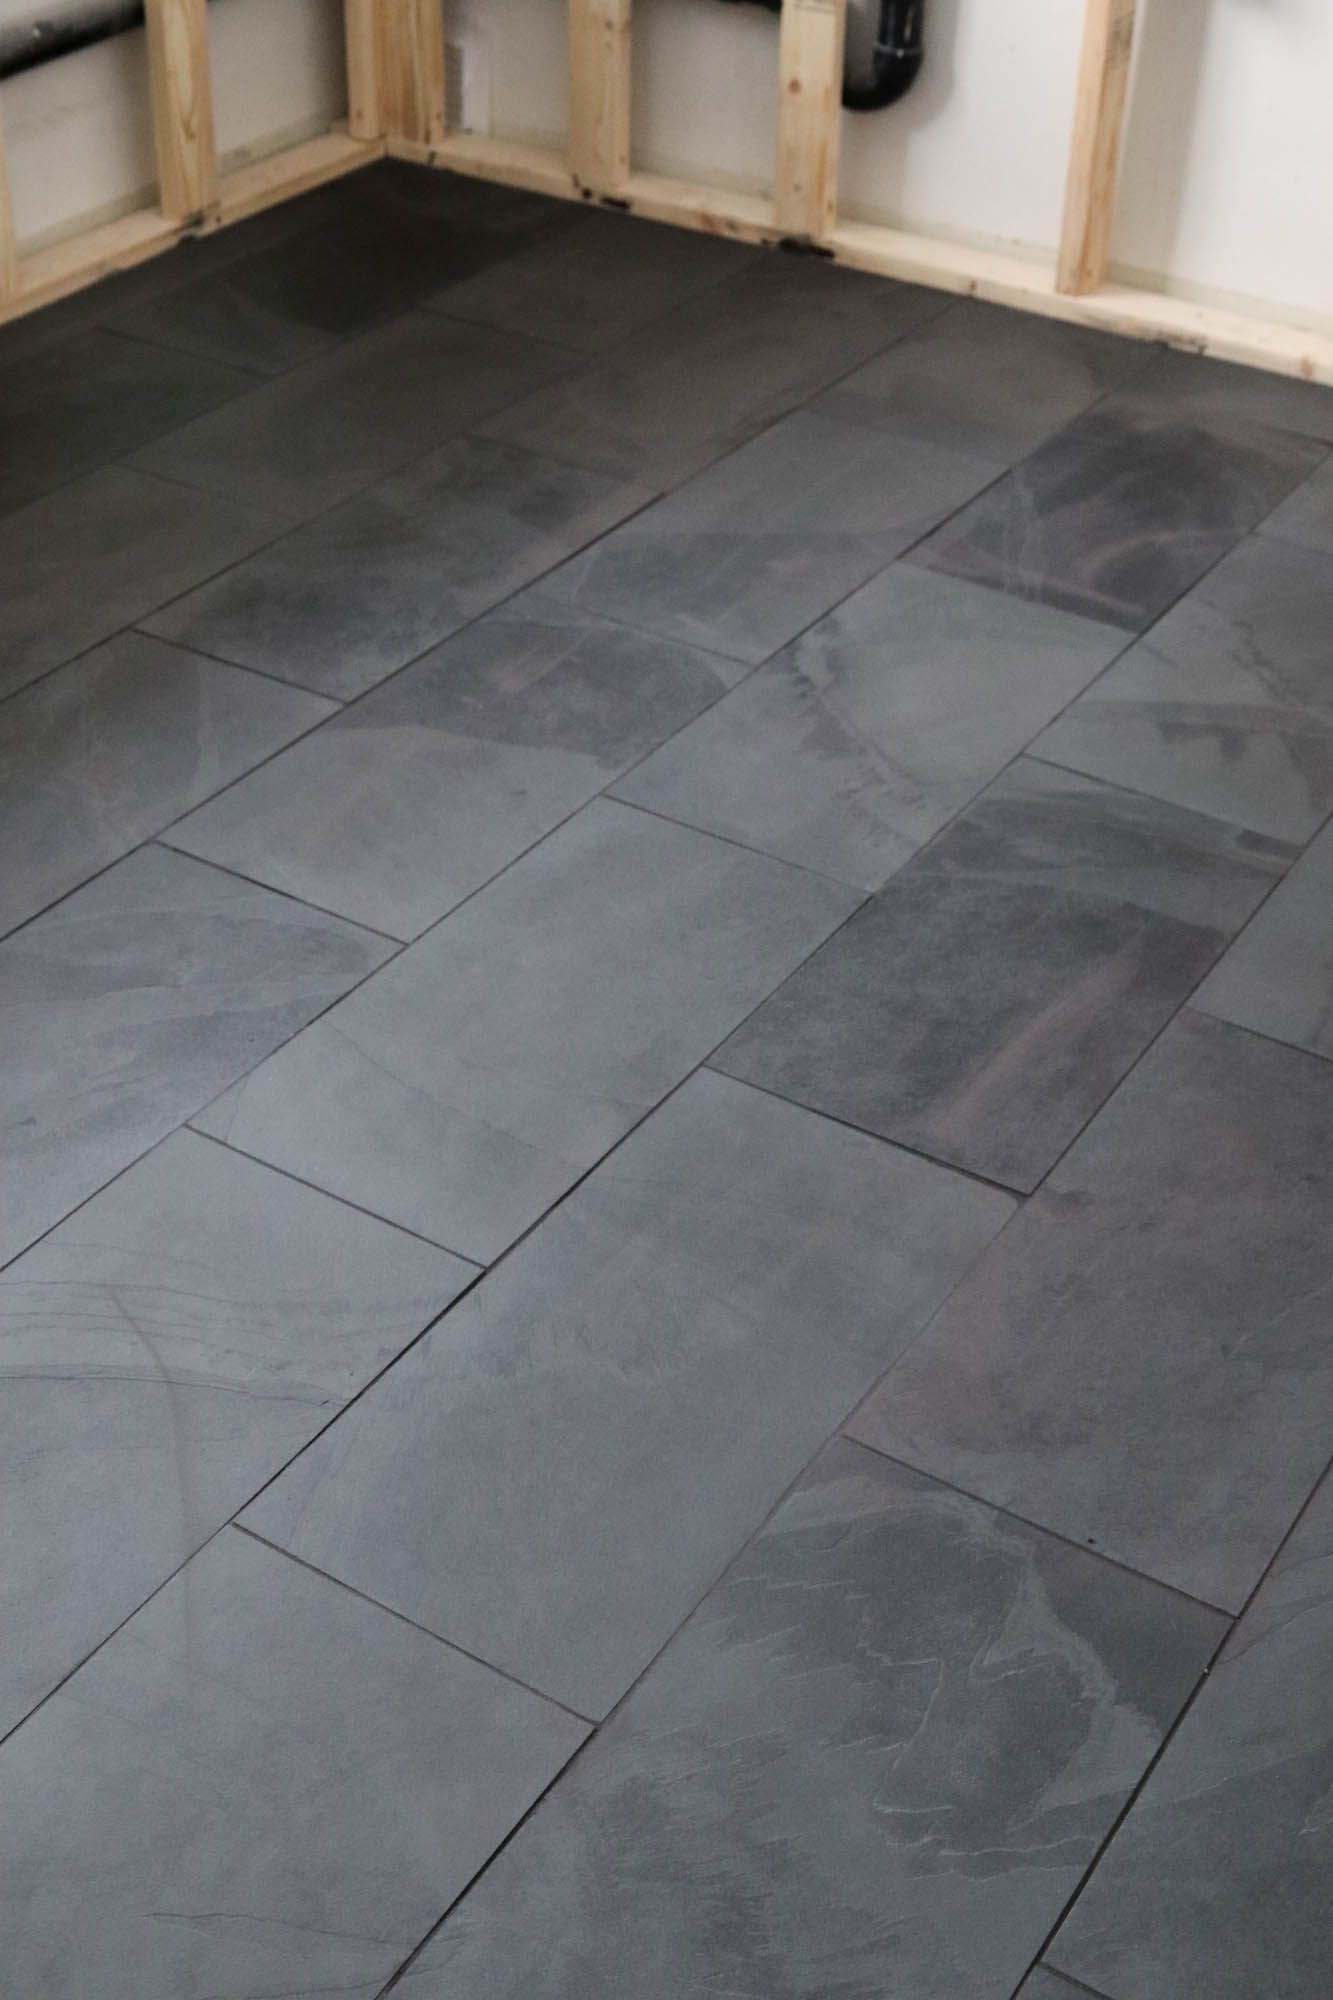 Black Tile In The Laundry Room Black Bathroom Floor Laundry